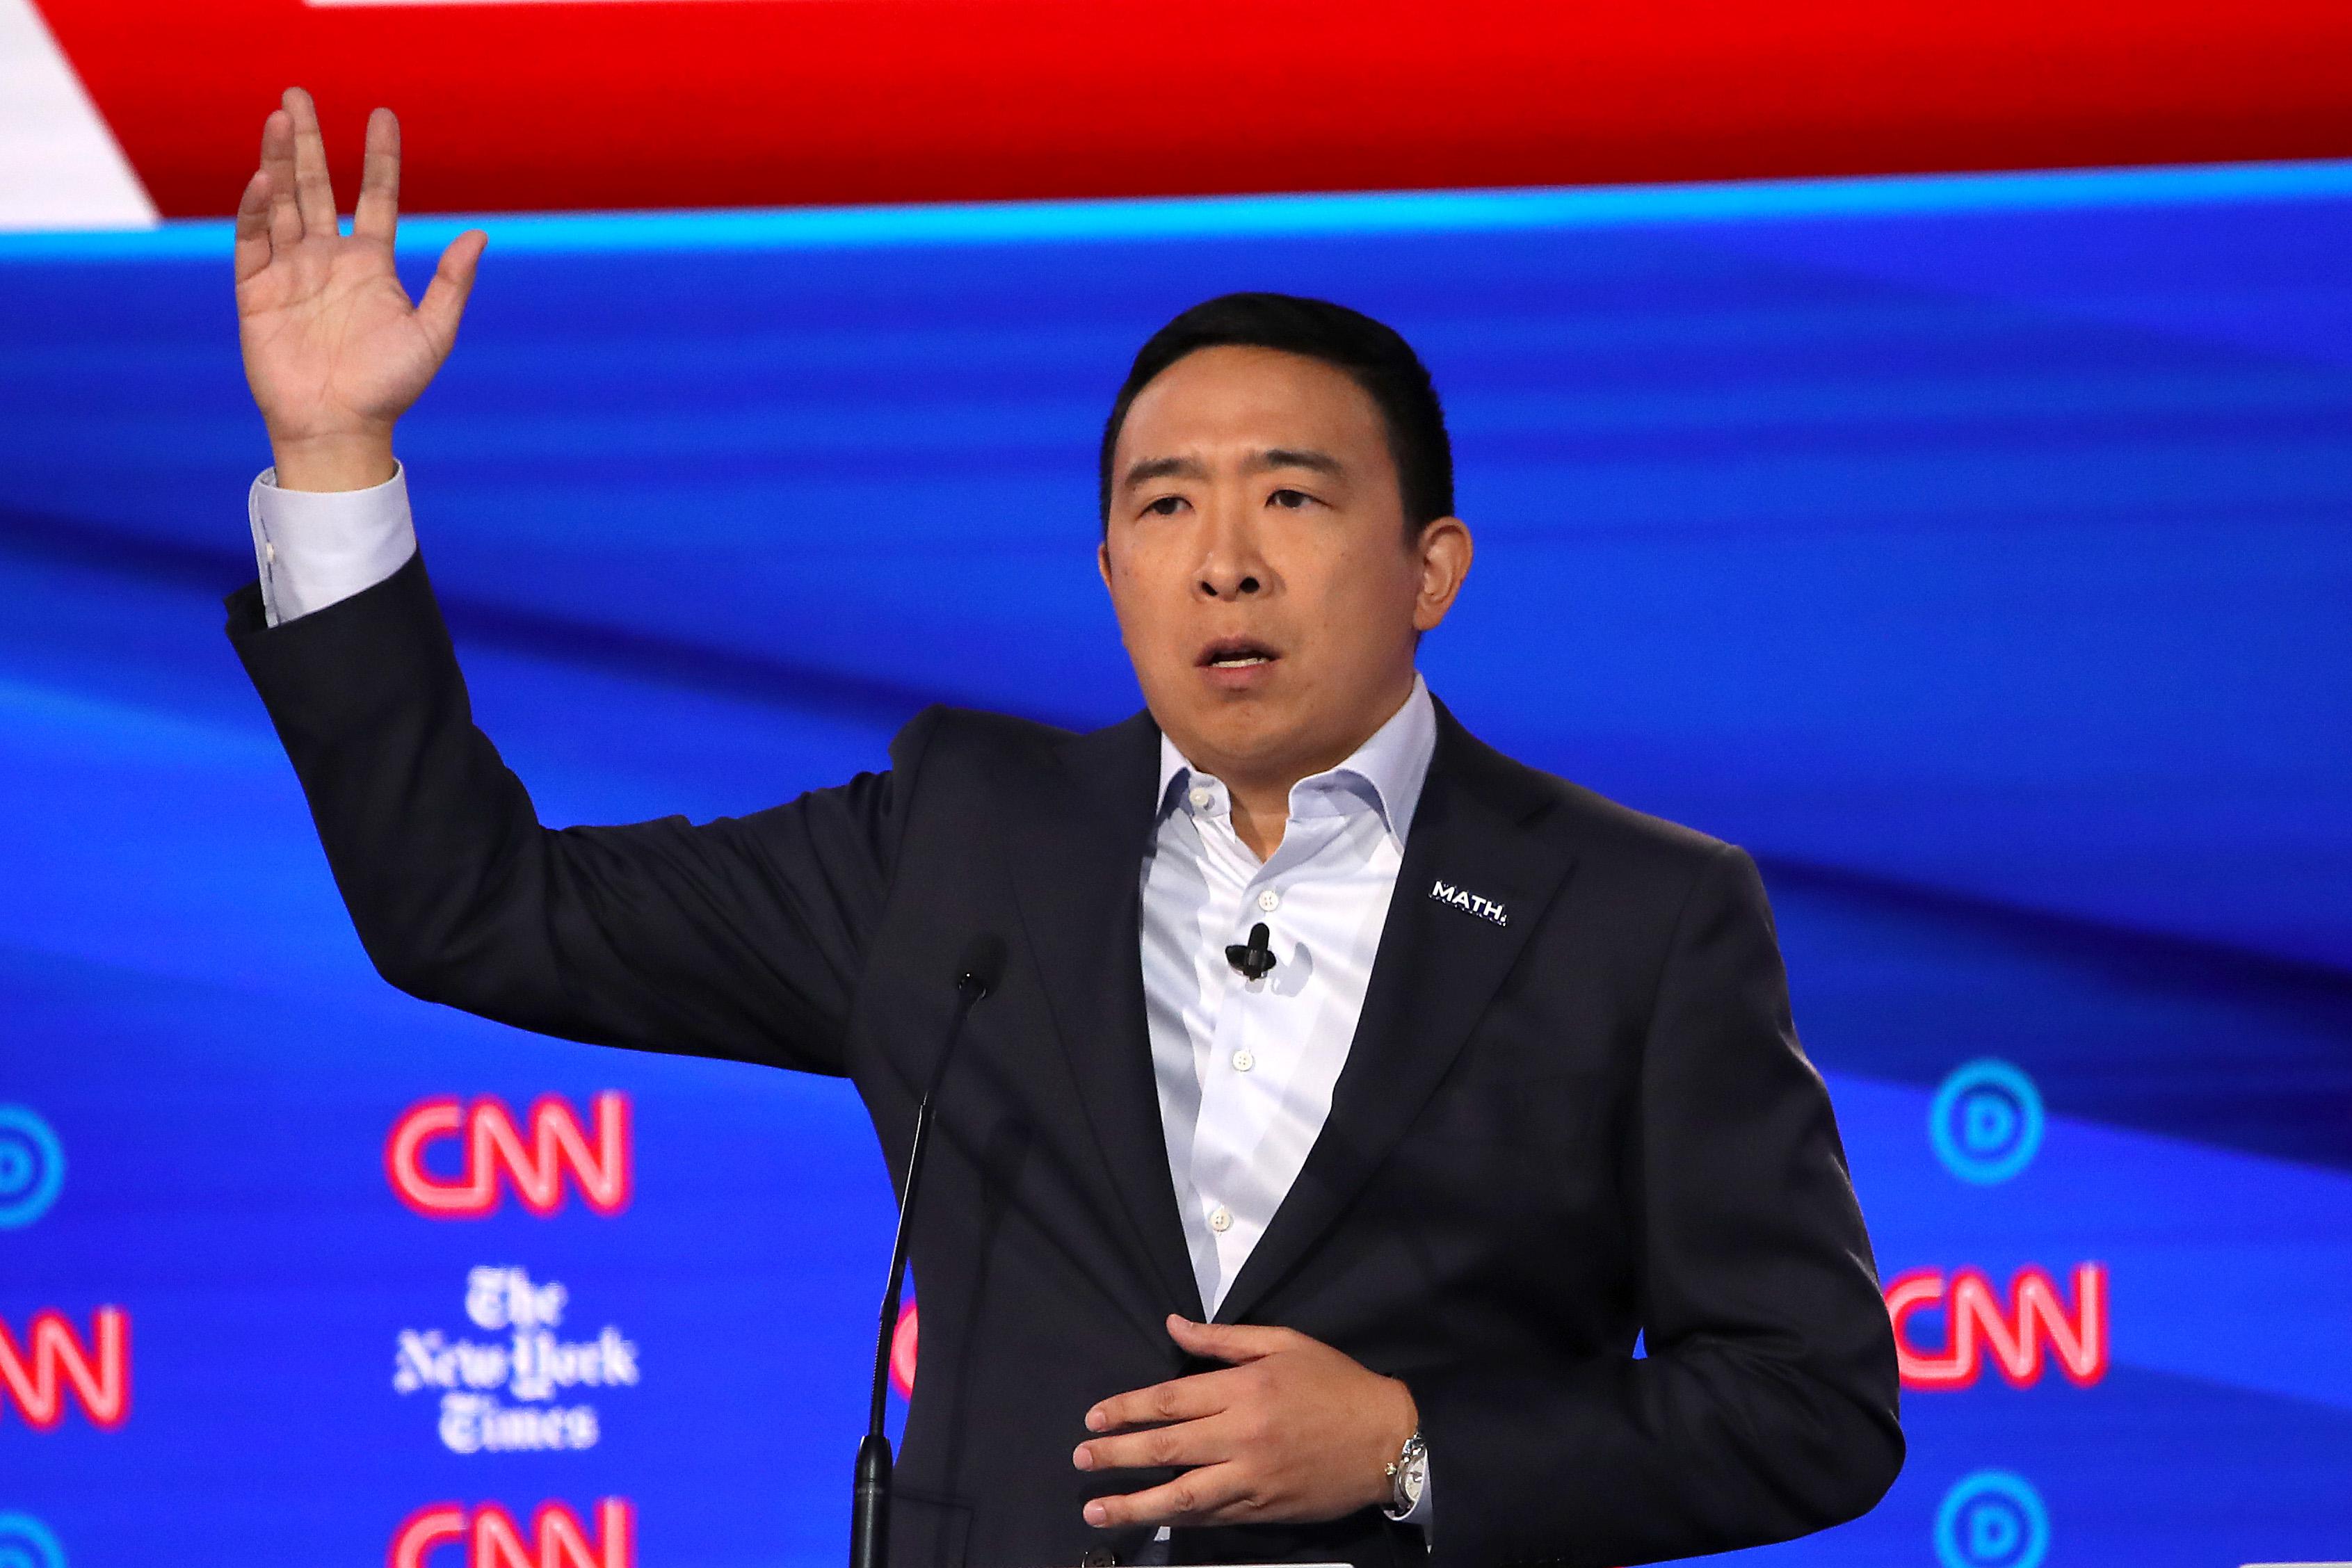 Andrew Yang at Democratic debate: No one uses Bing. 'Sorry, Microsoft, it's true.'